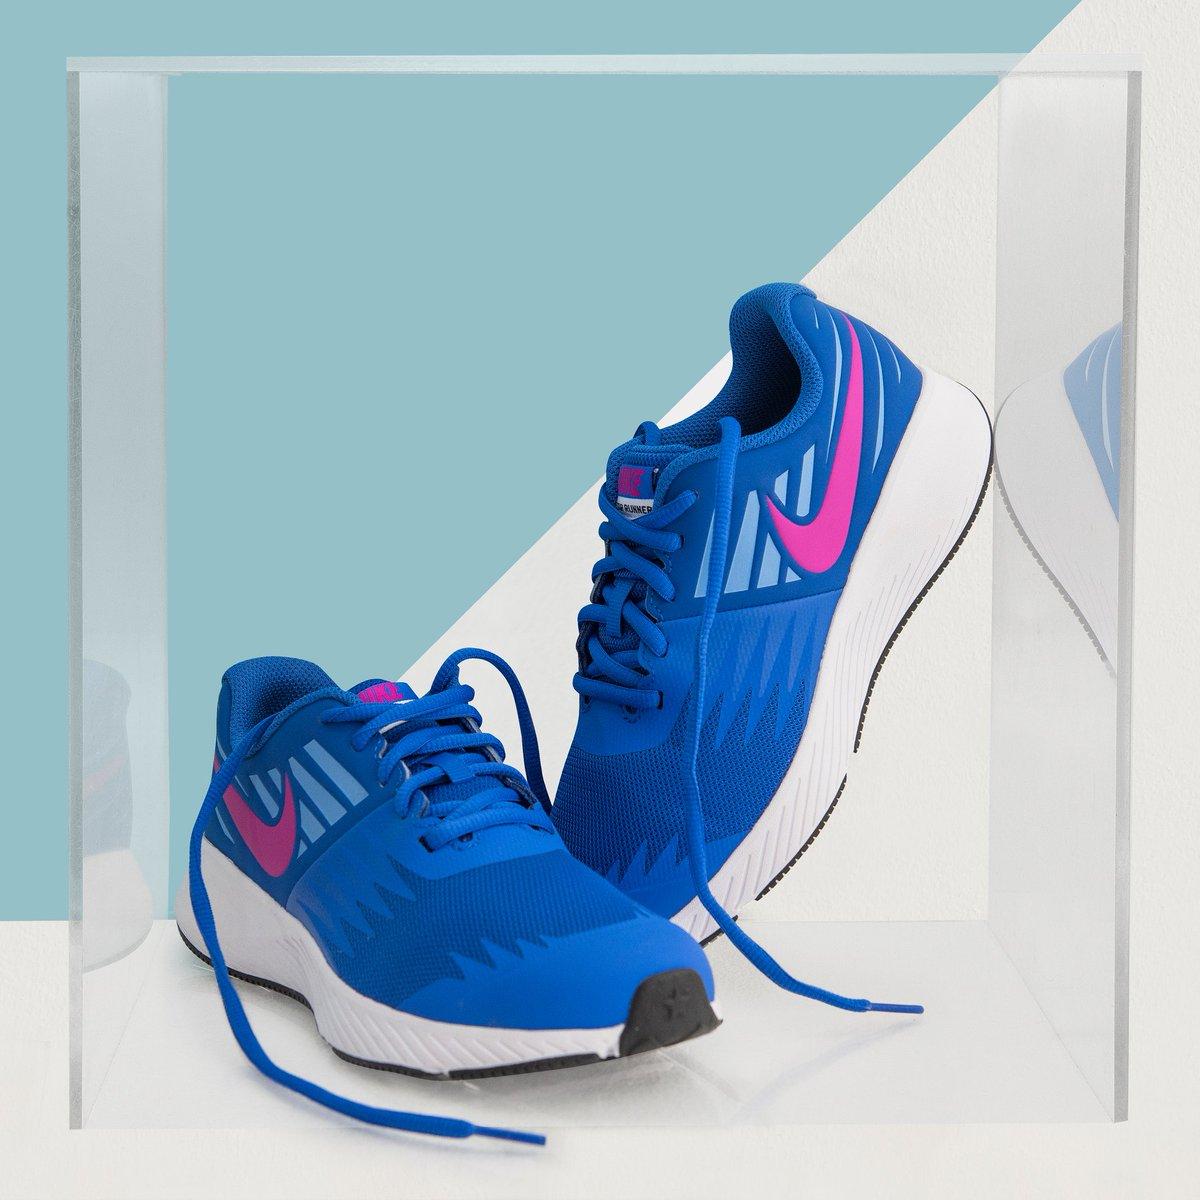 super cool Nike Star Runner trainers